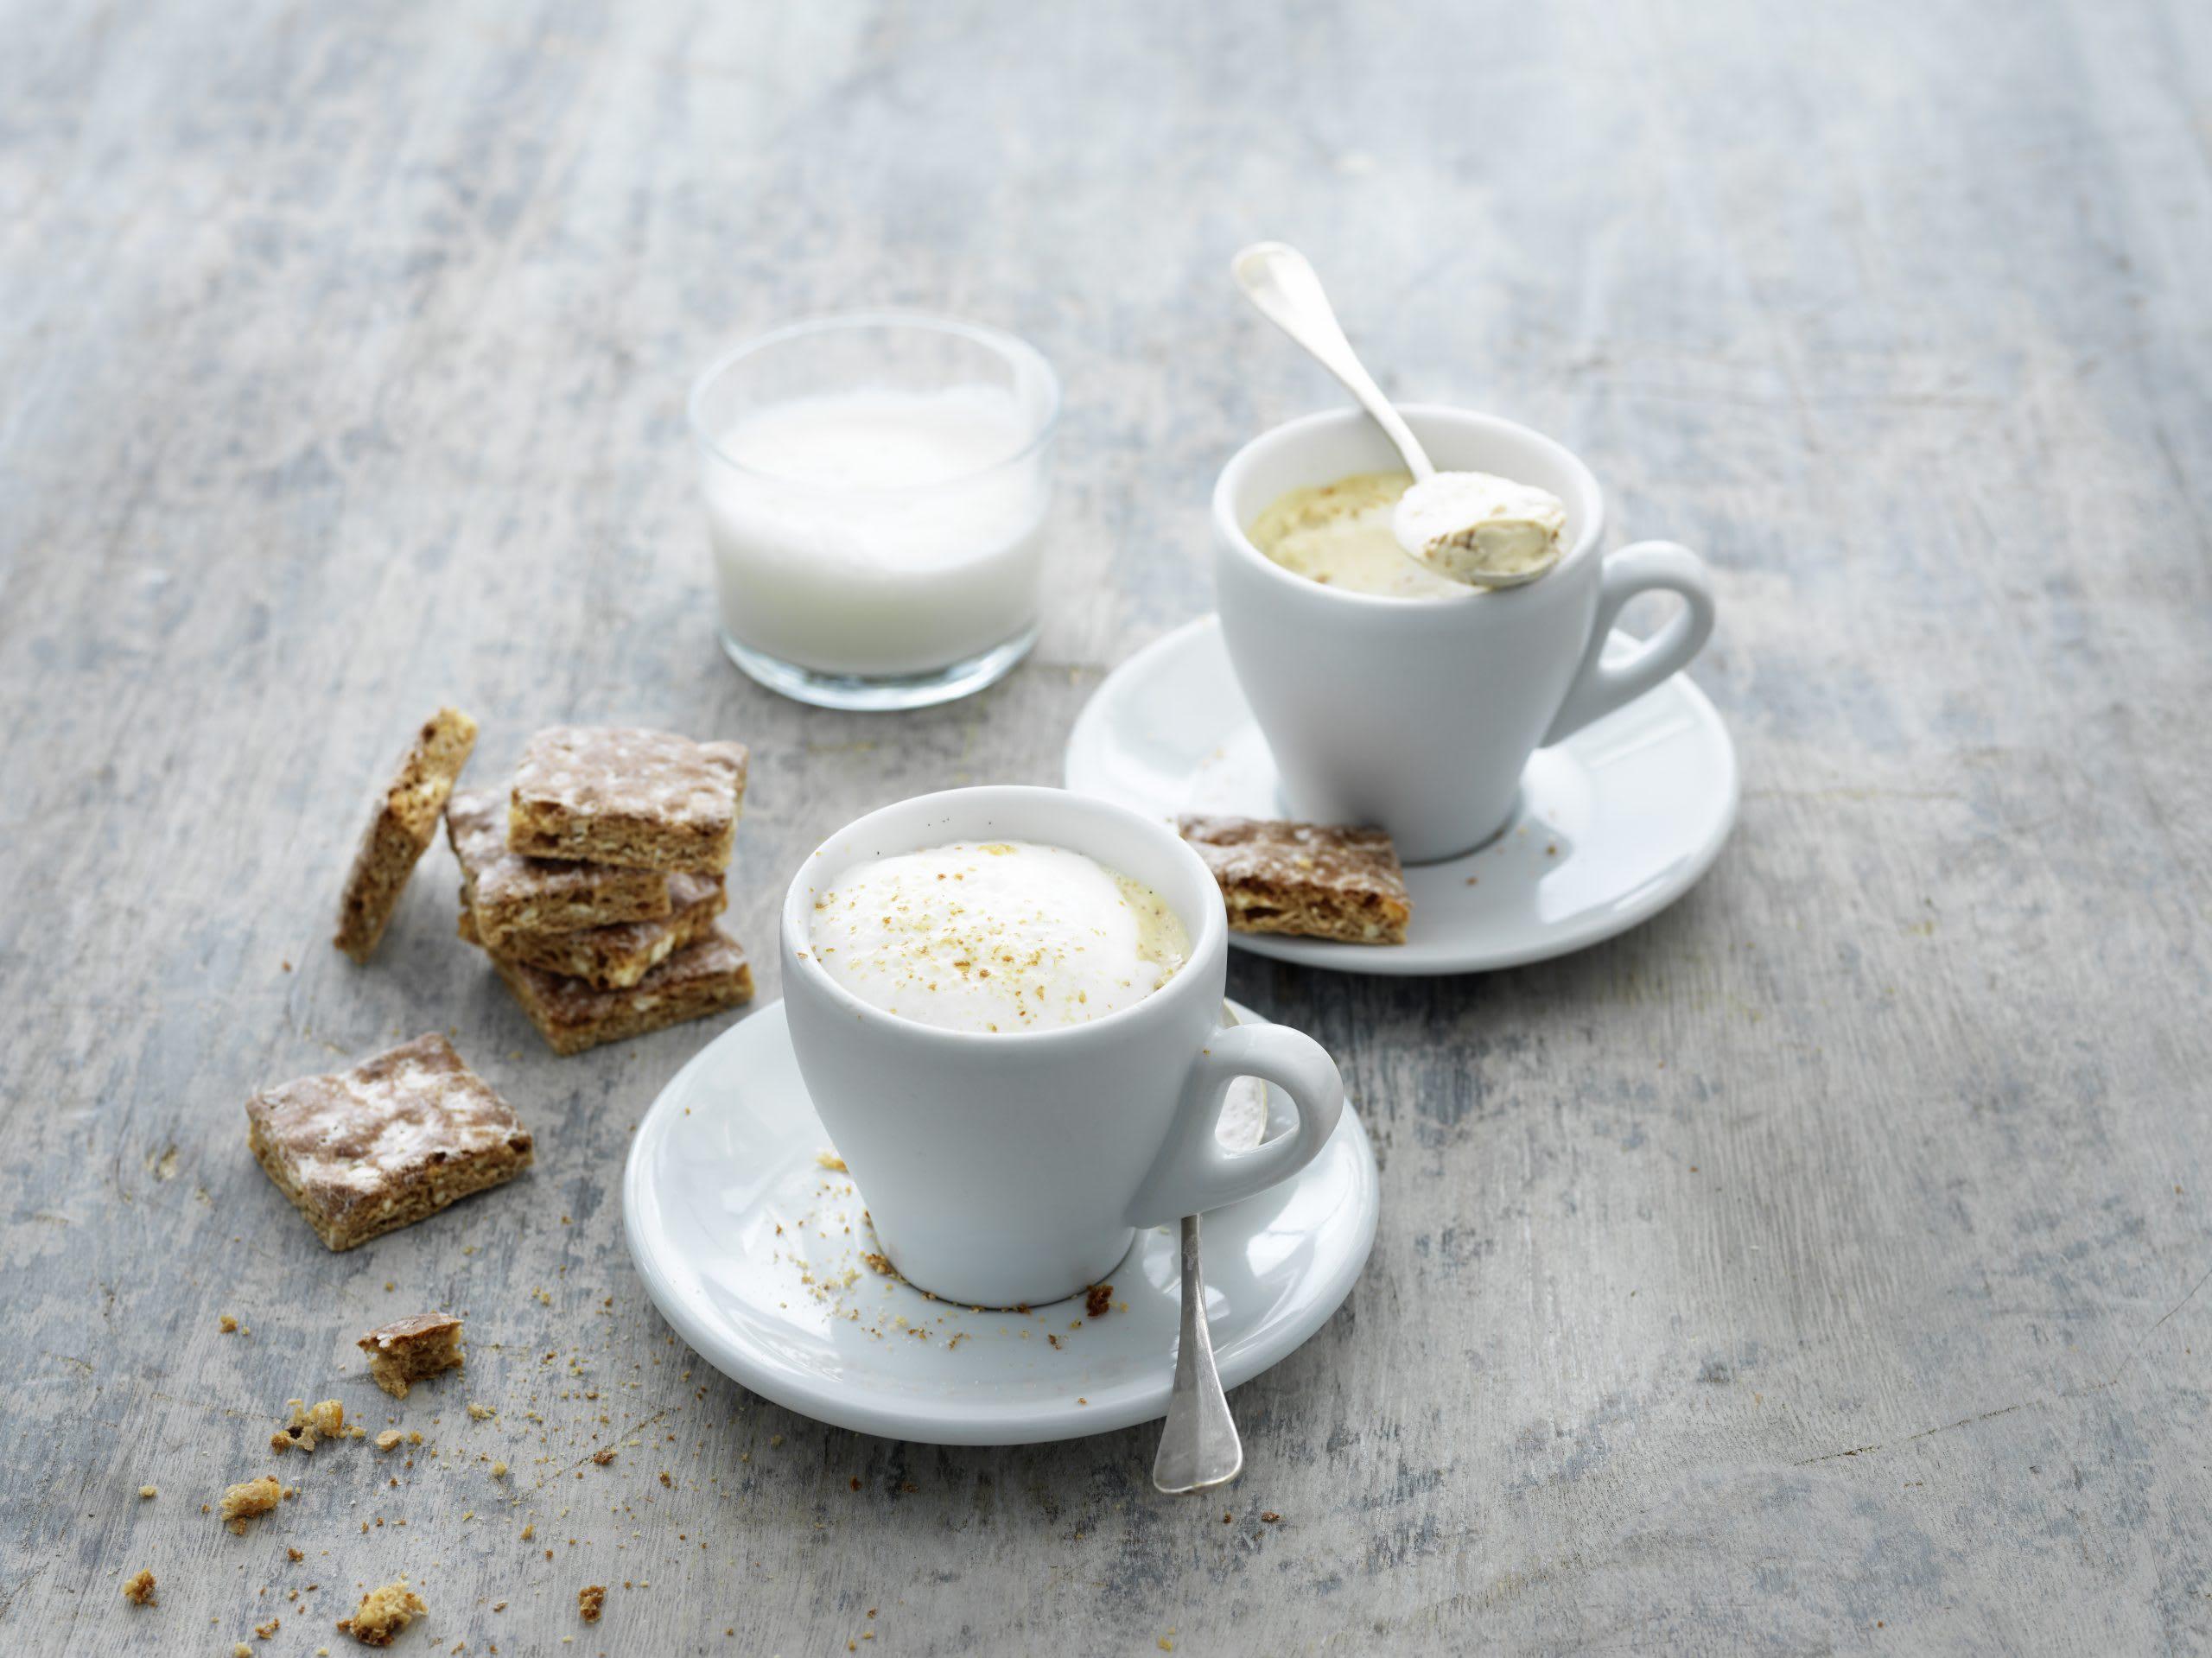 Basler Läckerli-Panna-cotta